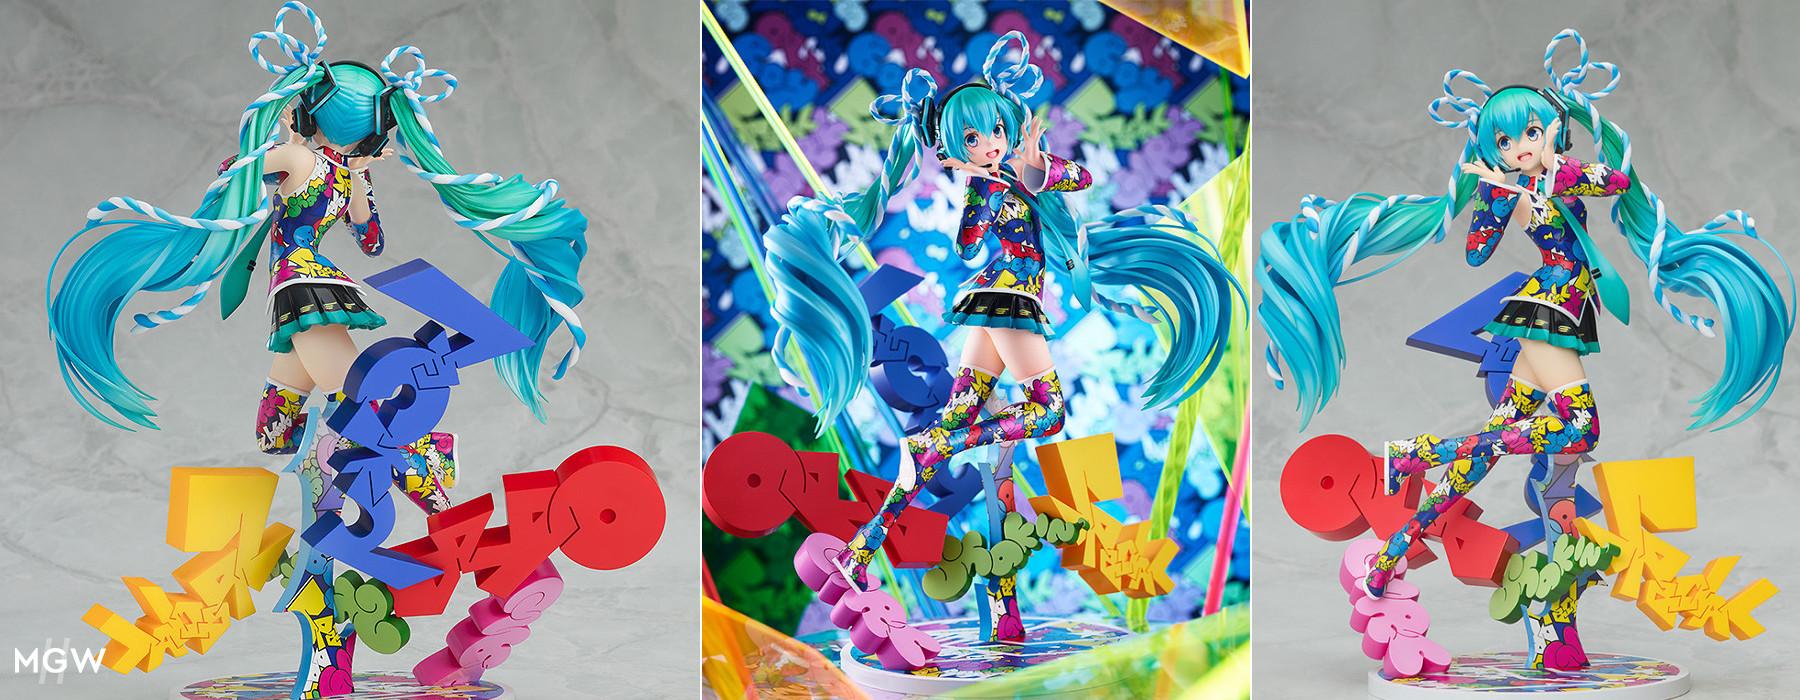 Hatsune Miku MIKU EXPO 5th Anniv. / Lucky☆Orb UTA X KASOKU Ver.